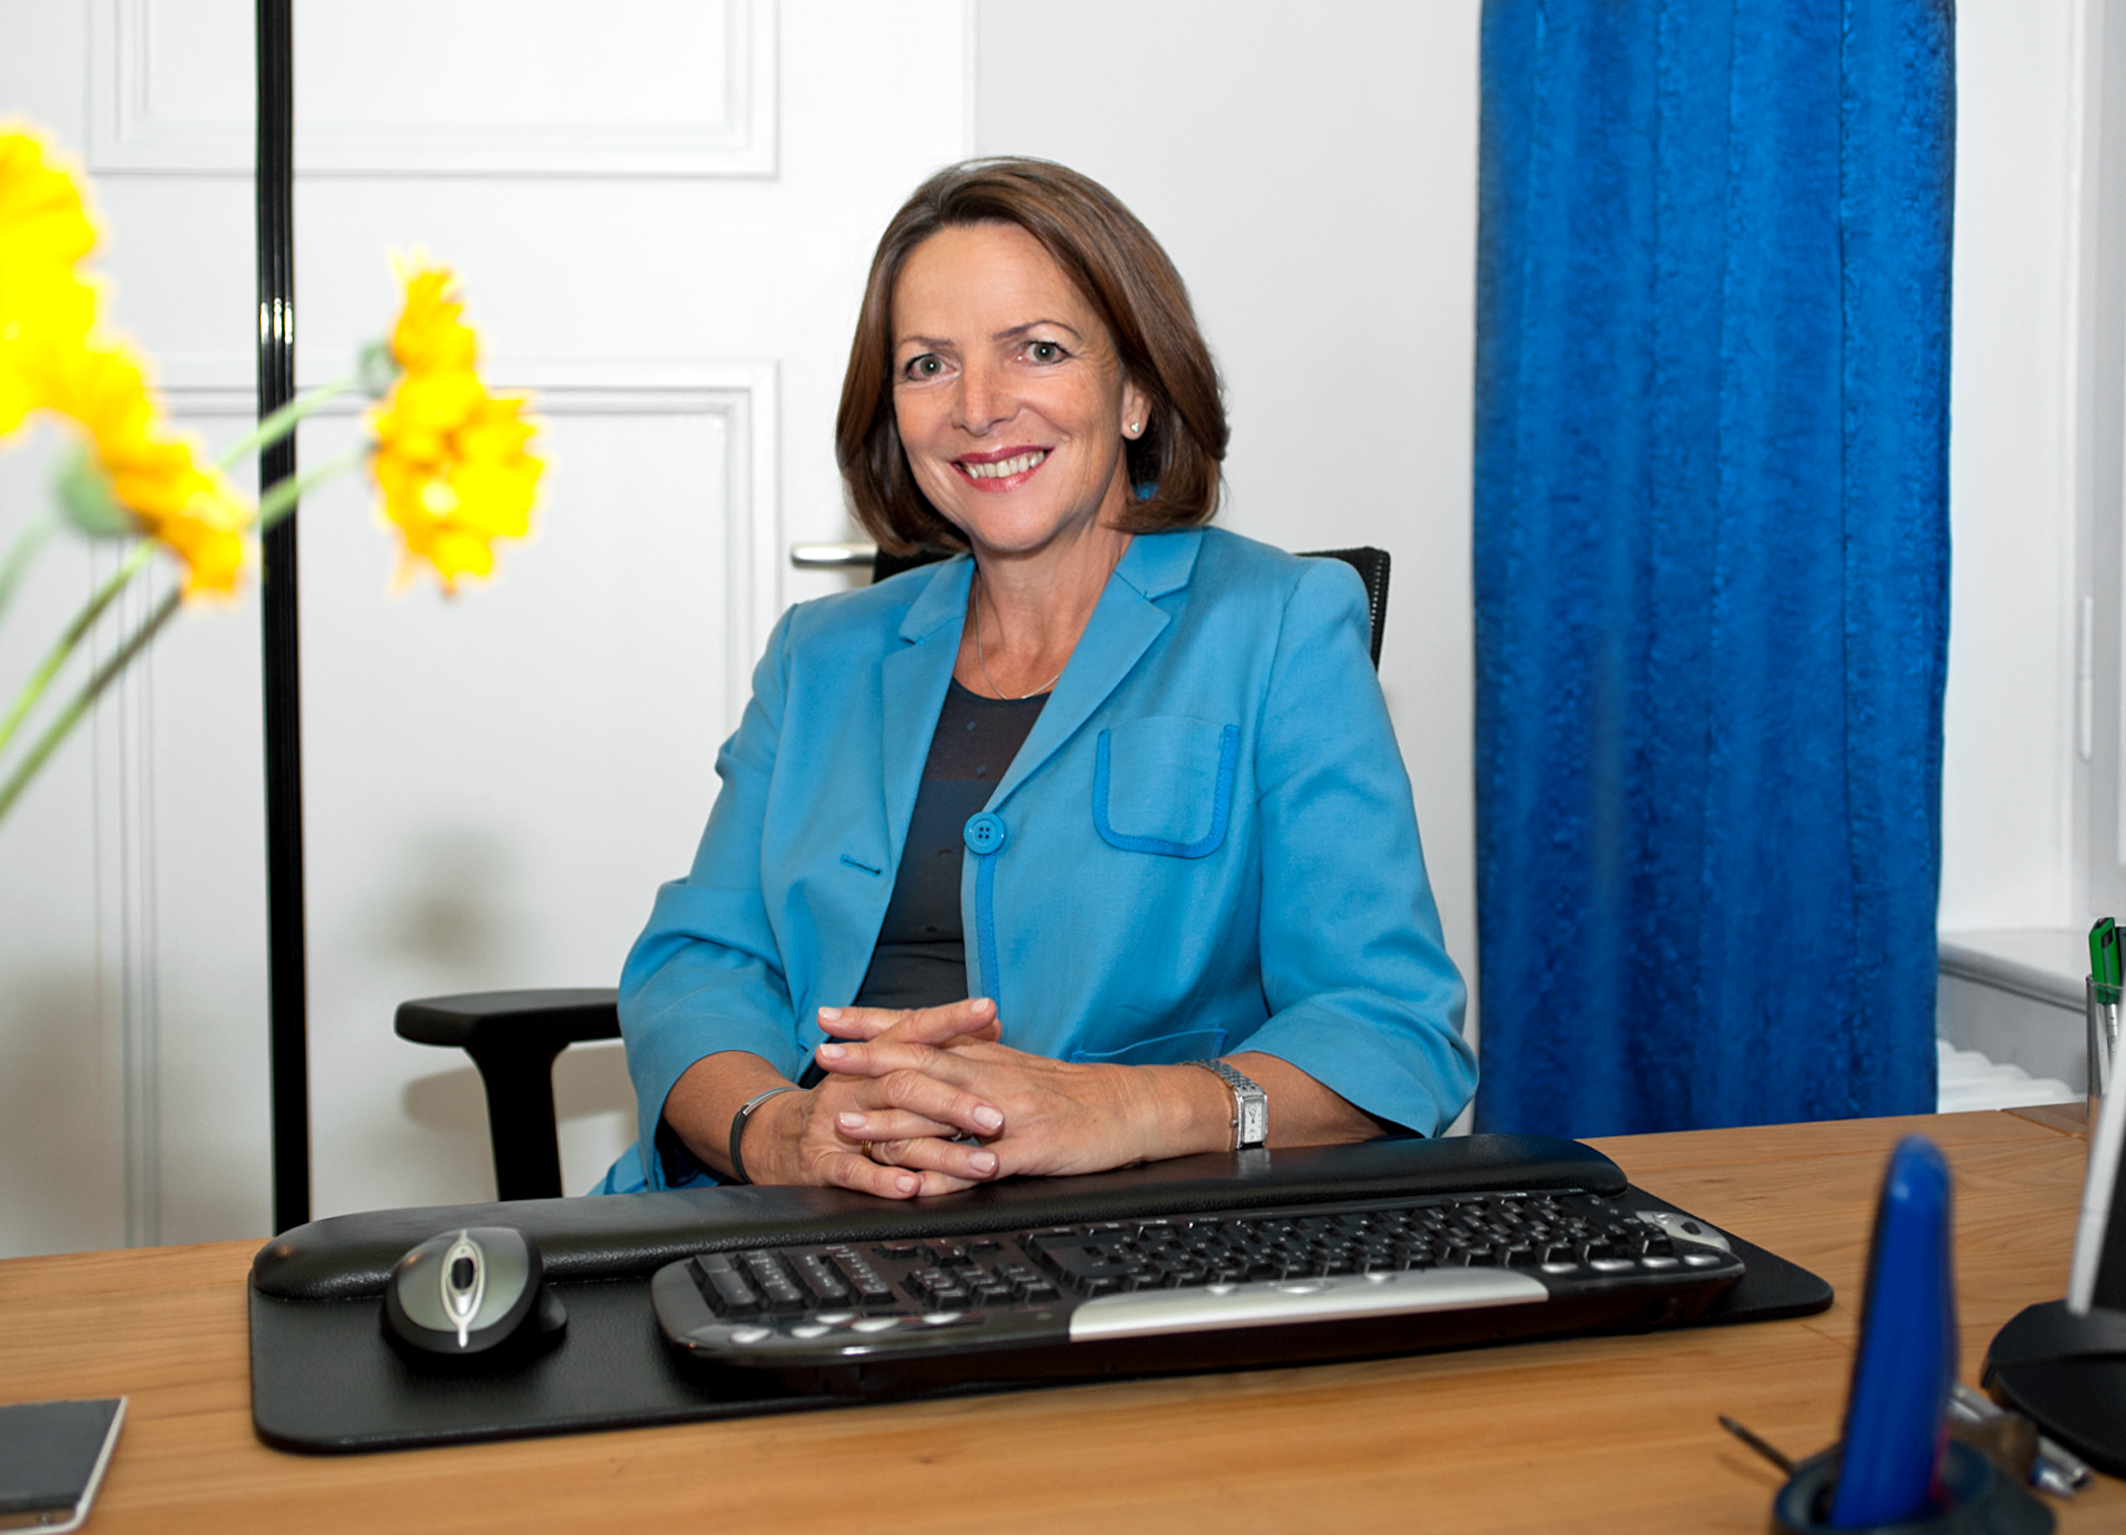 Gerda Seelbach